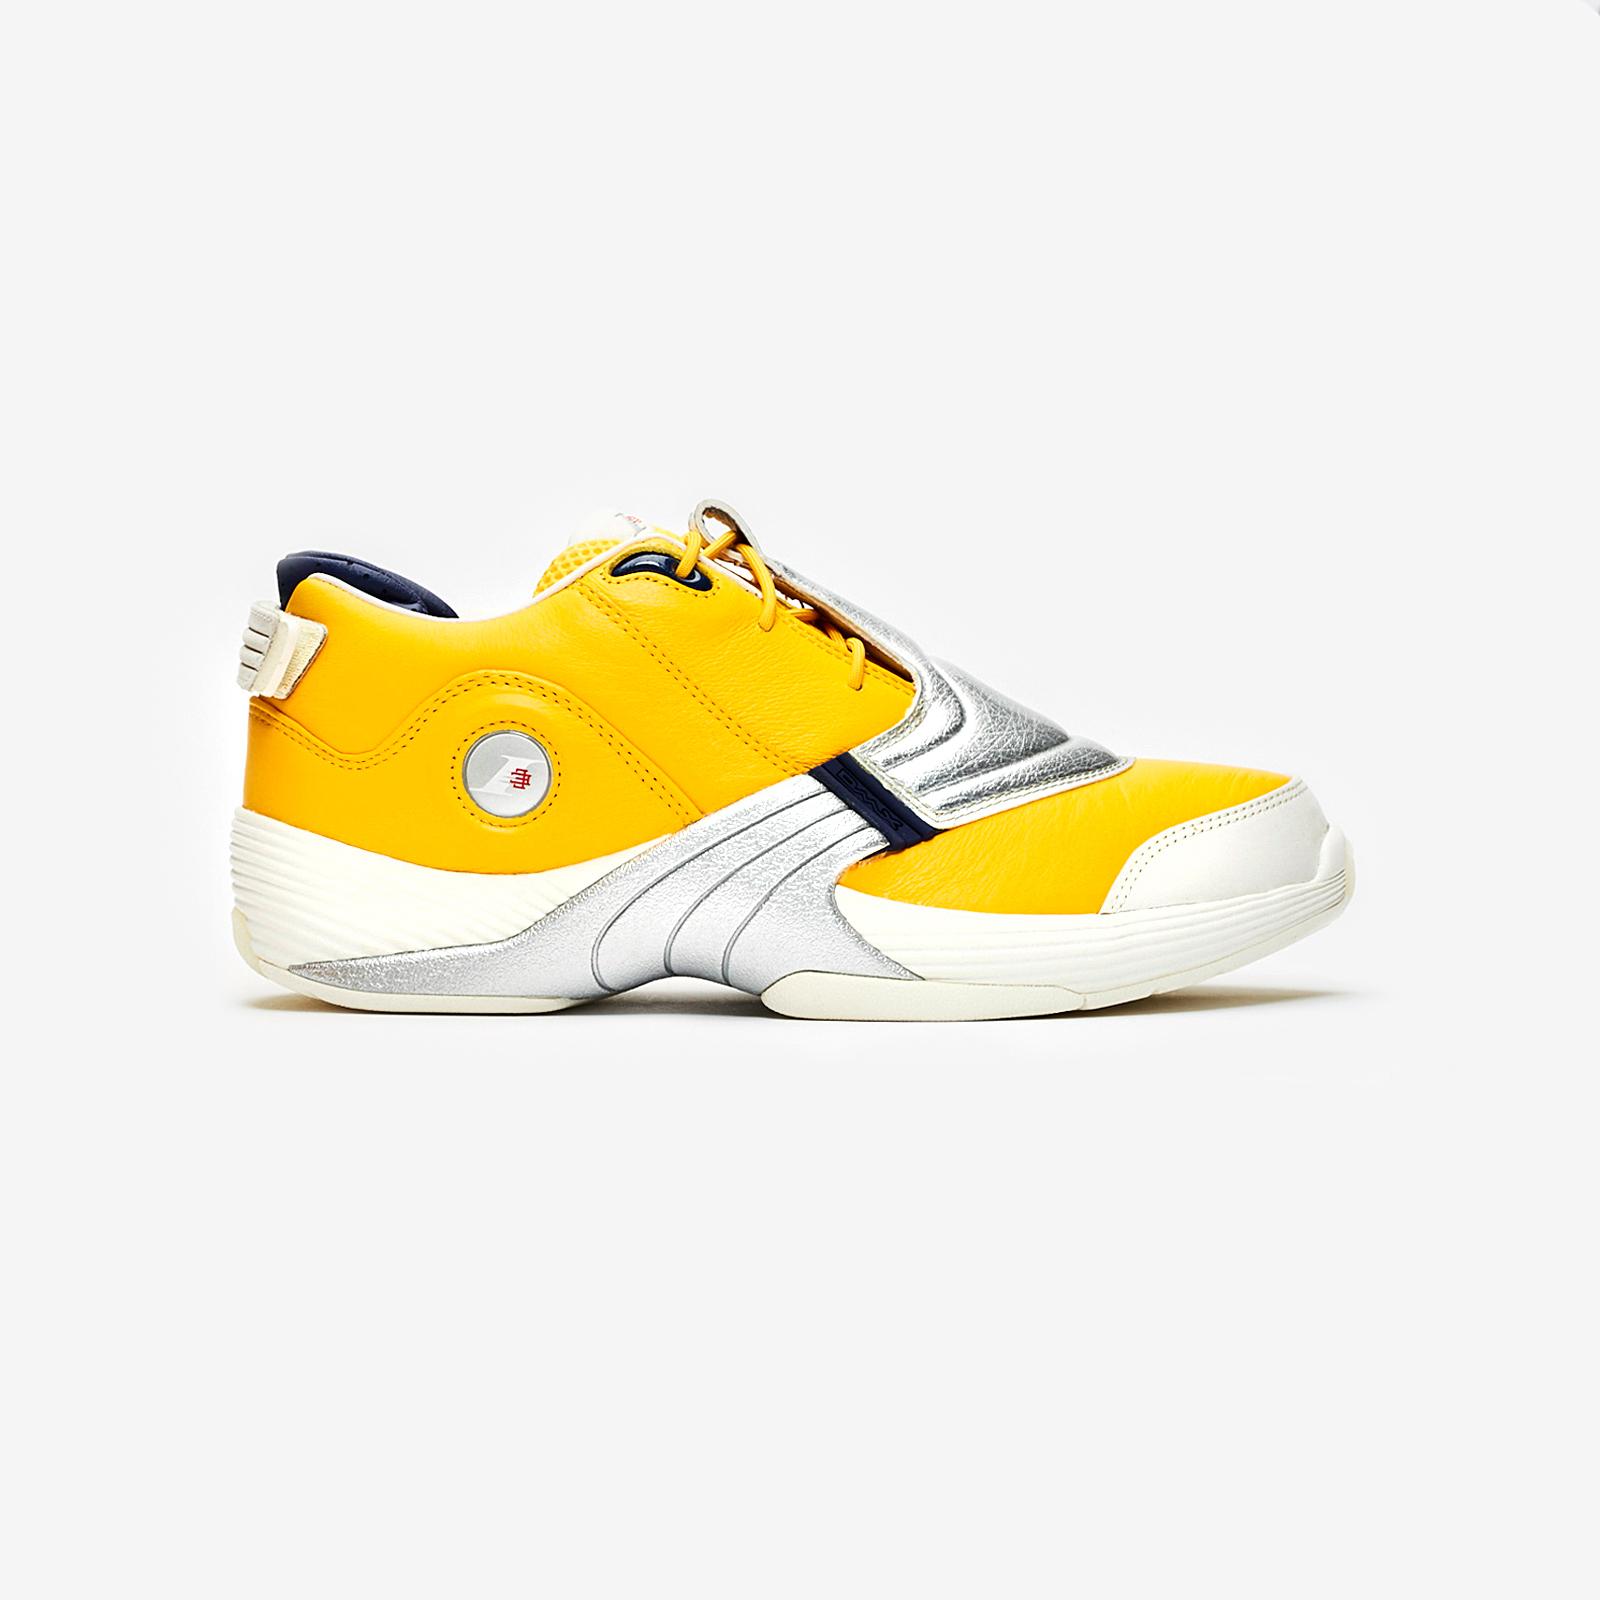 Reebok Answer V x Eric Emanuel Eh0408 Sneakersnstuff